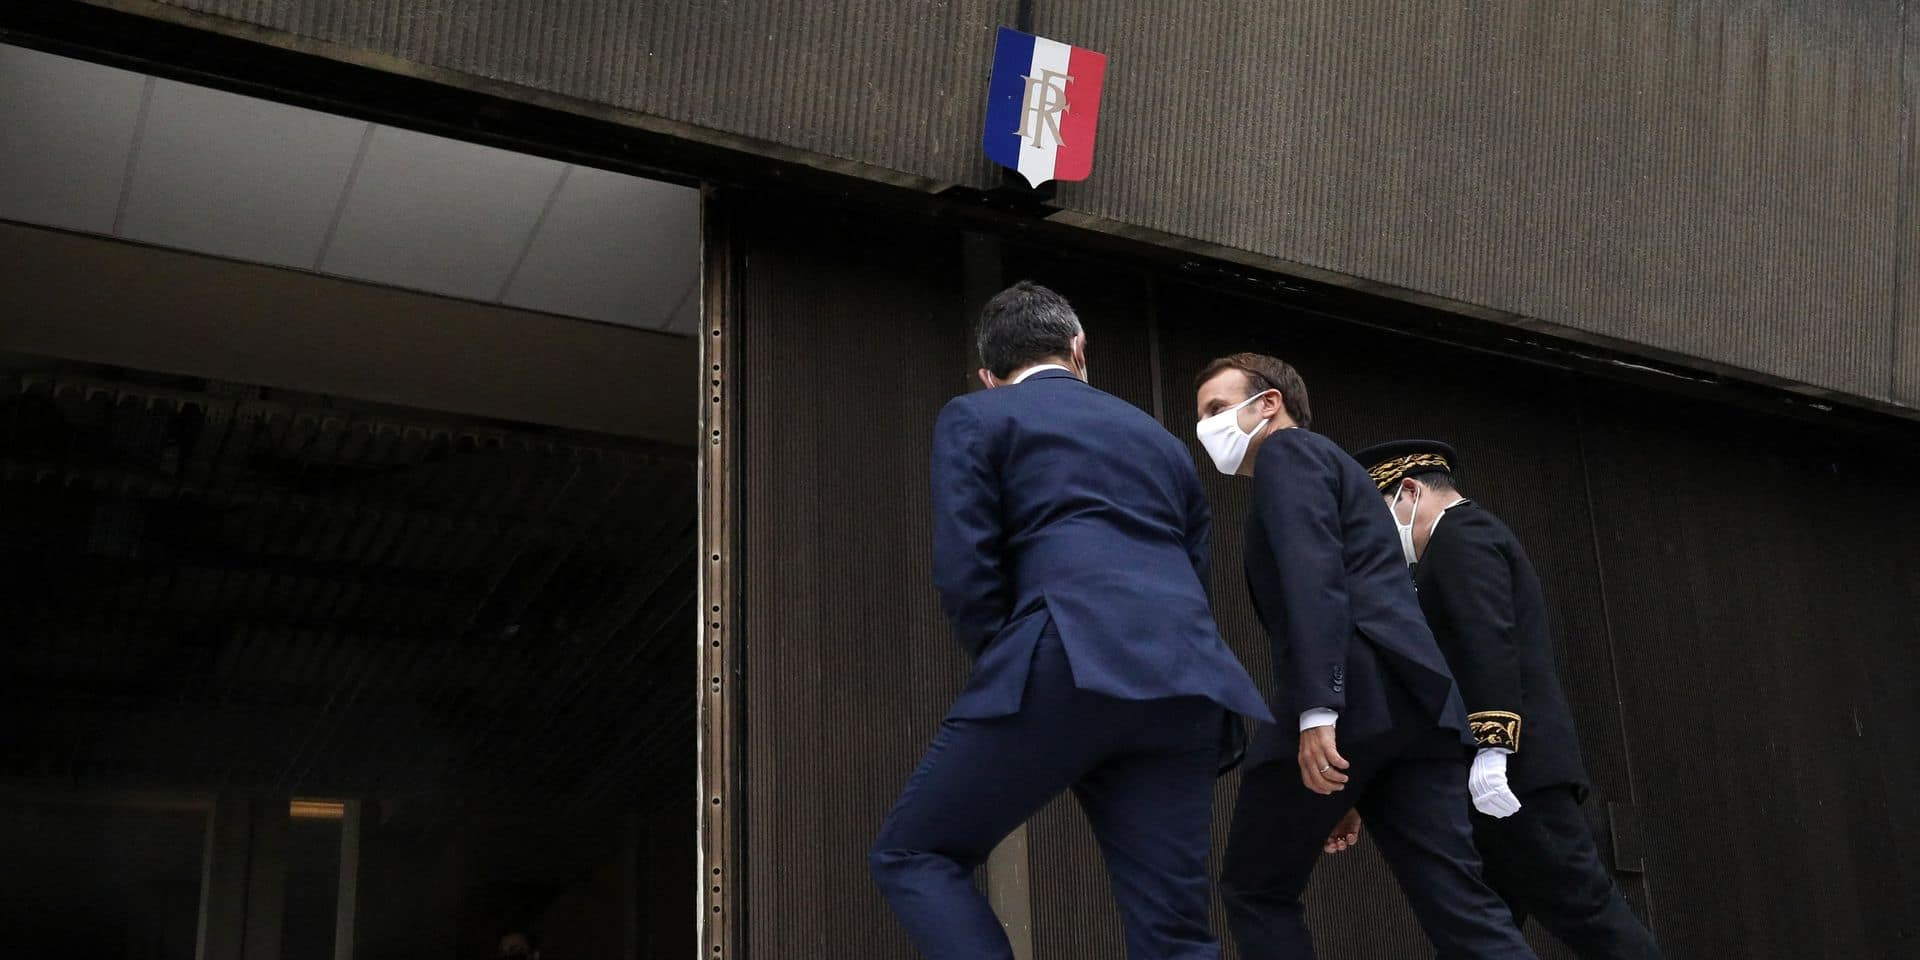 President Macron Visits Prefecture Headquarters - Bobigny